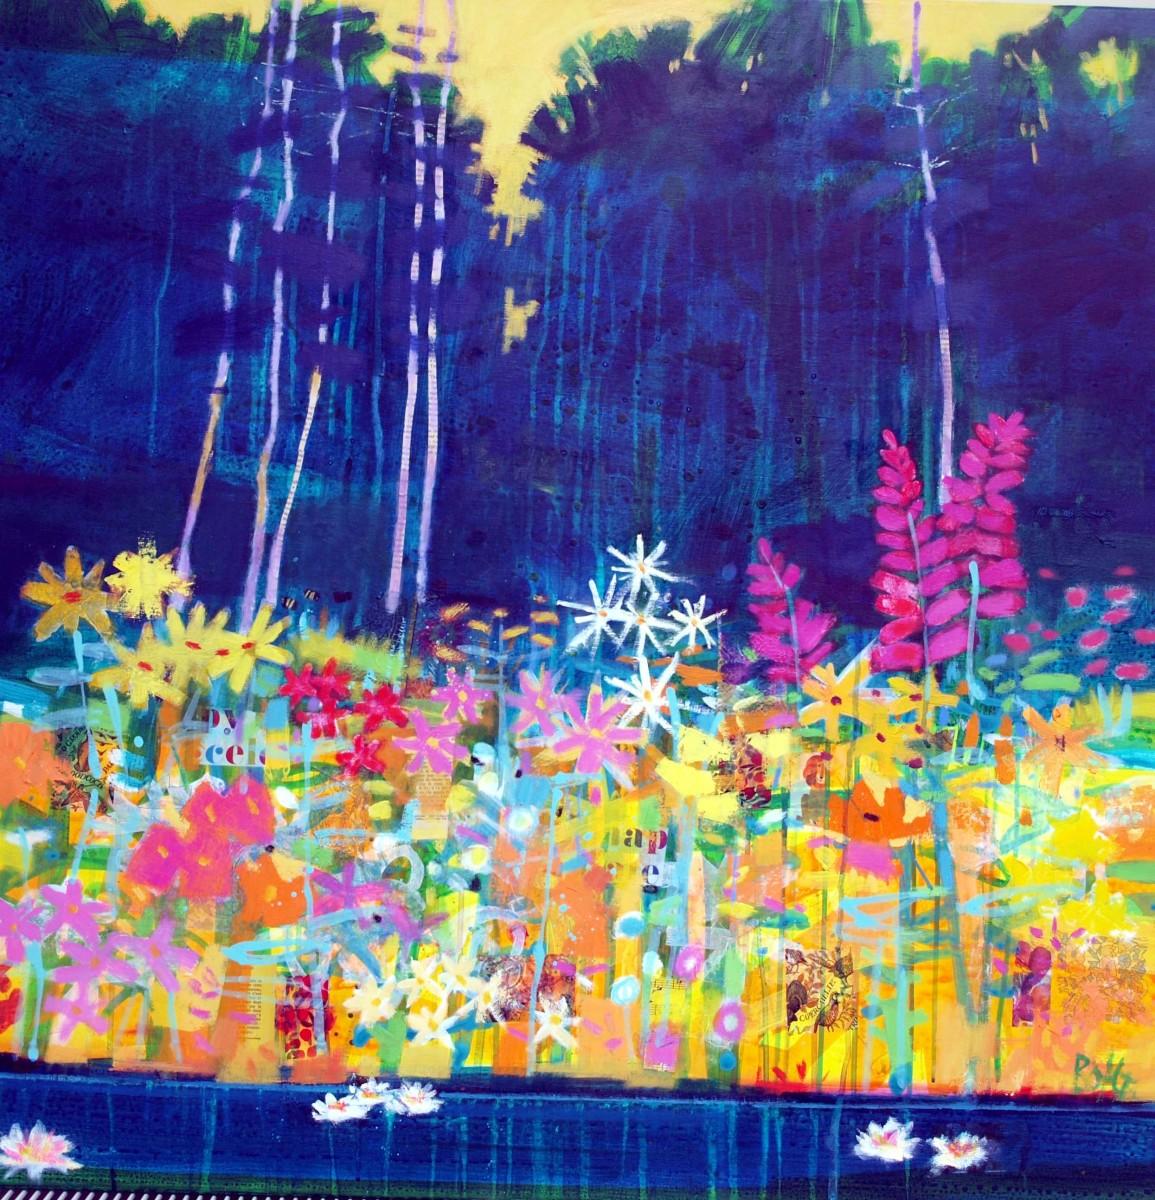 Summer pond 2 by francis boag